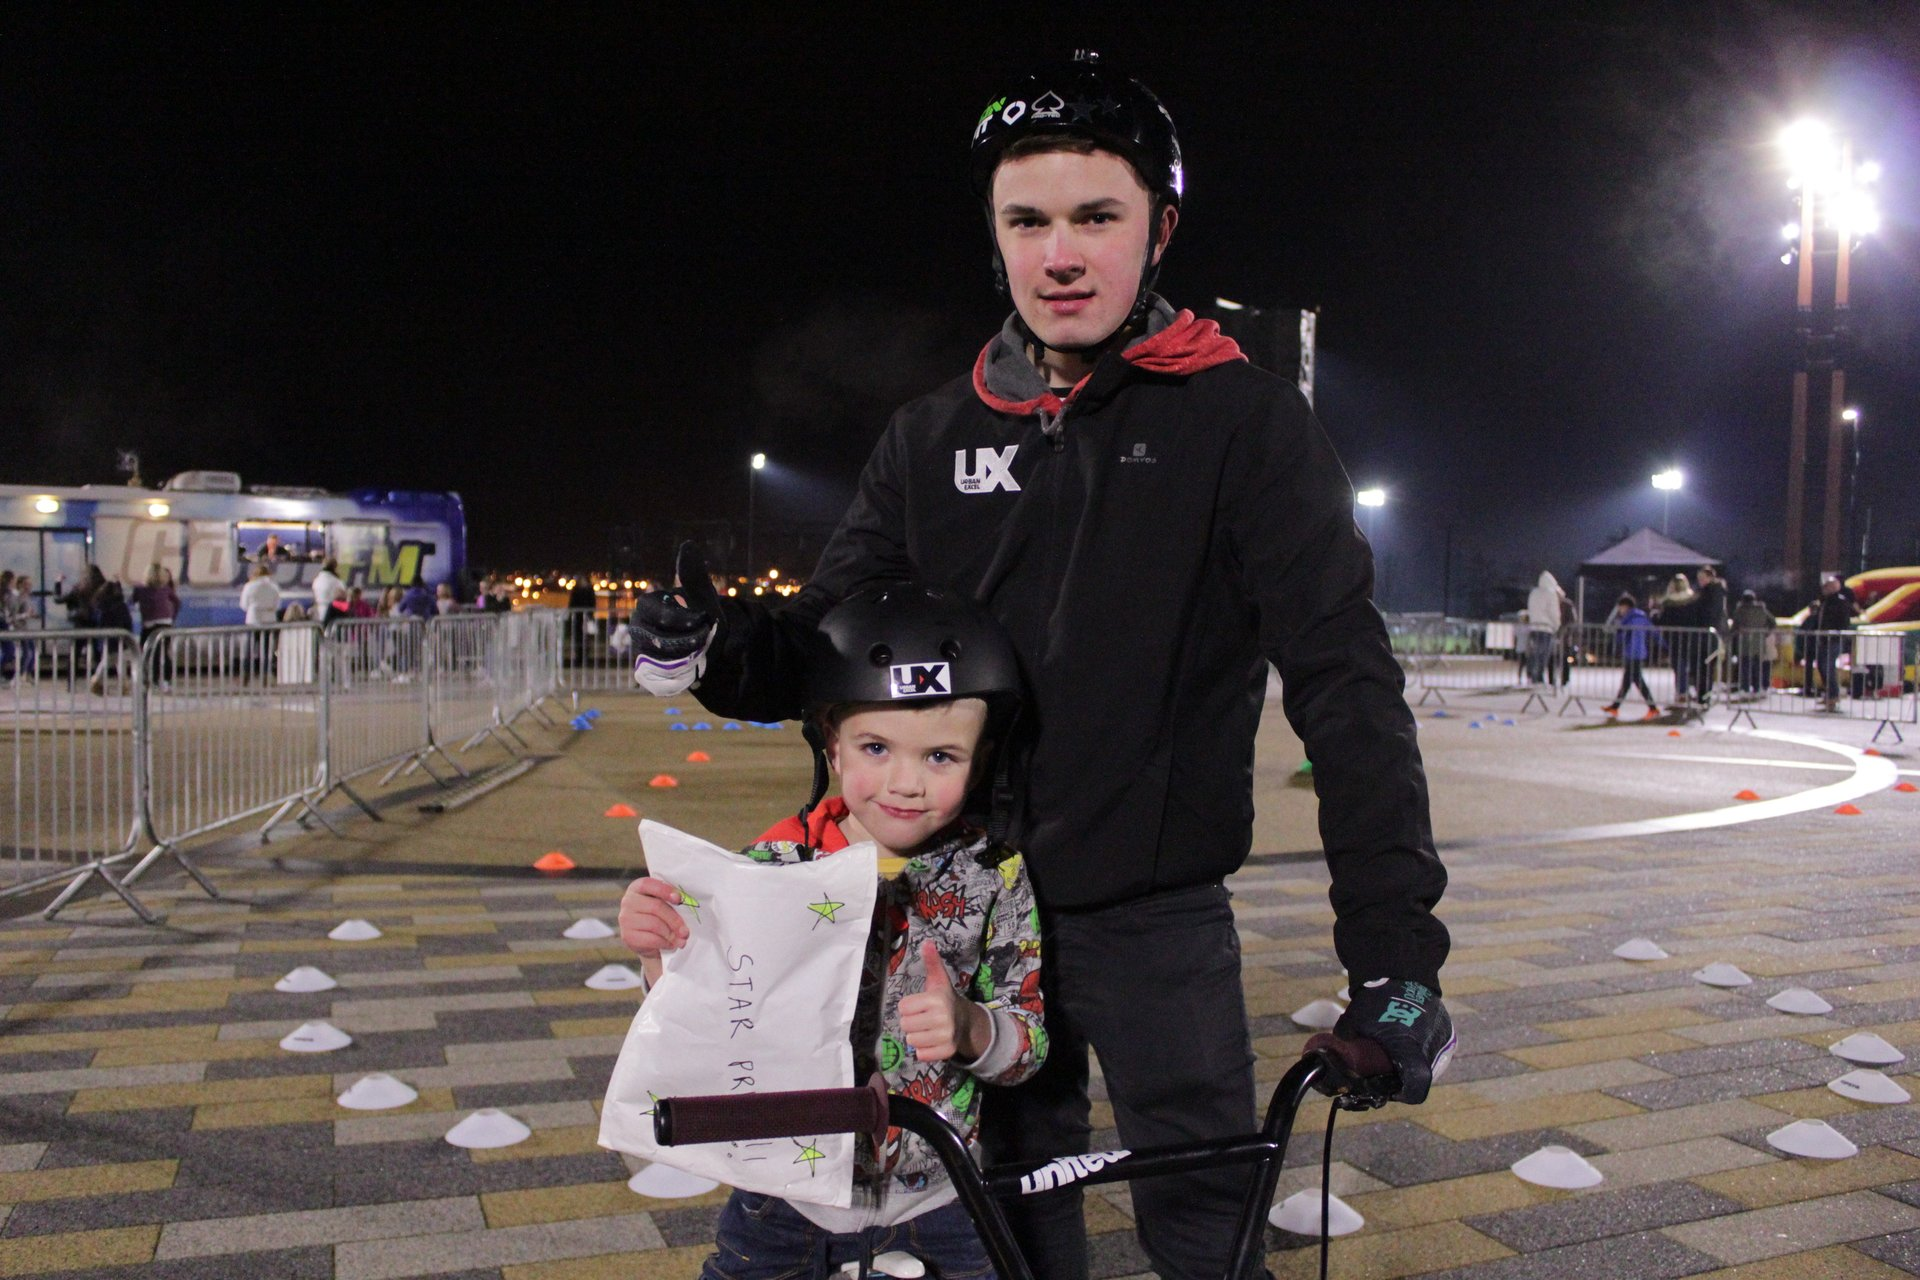 BMX event  - Northern Ireland